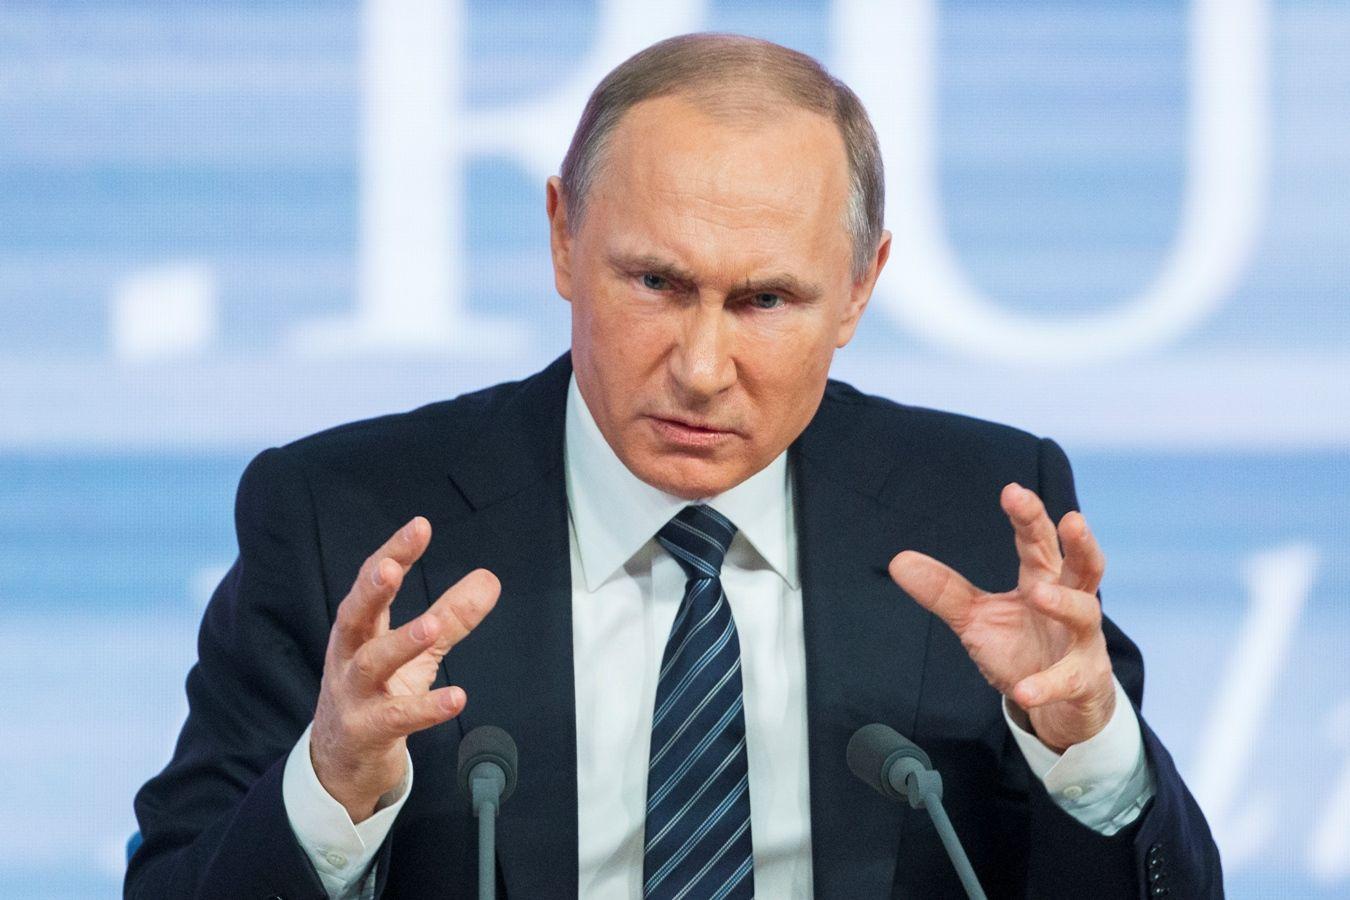 Eyewitness To The Kharkiv Demonstrations: Going Against The PutinMachine